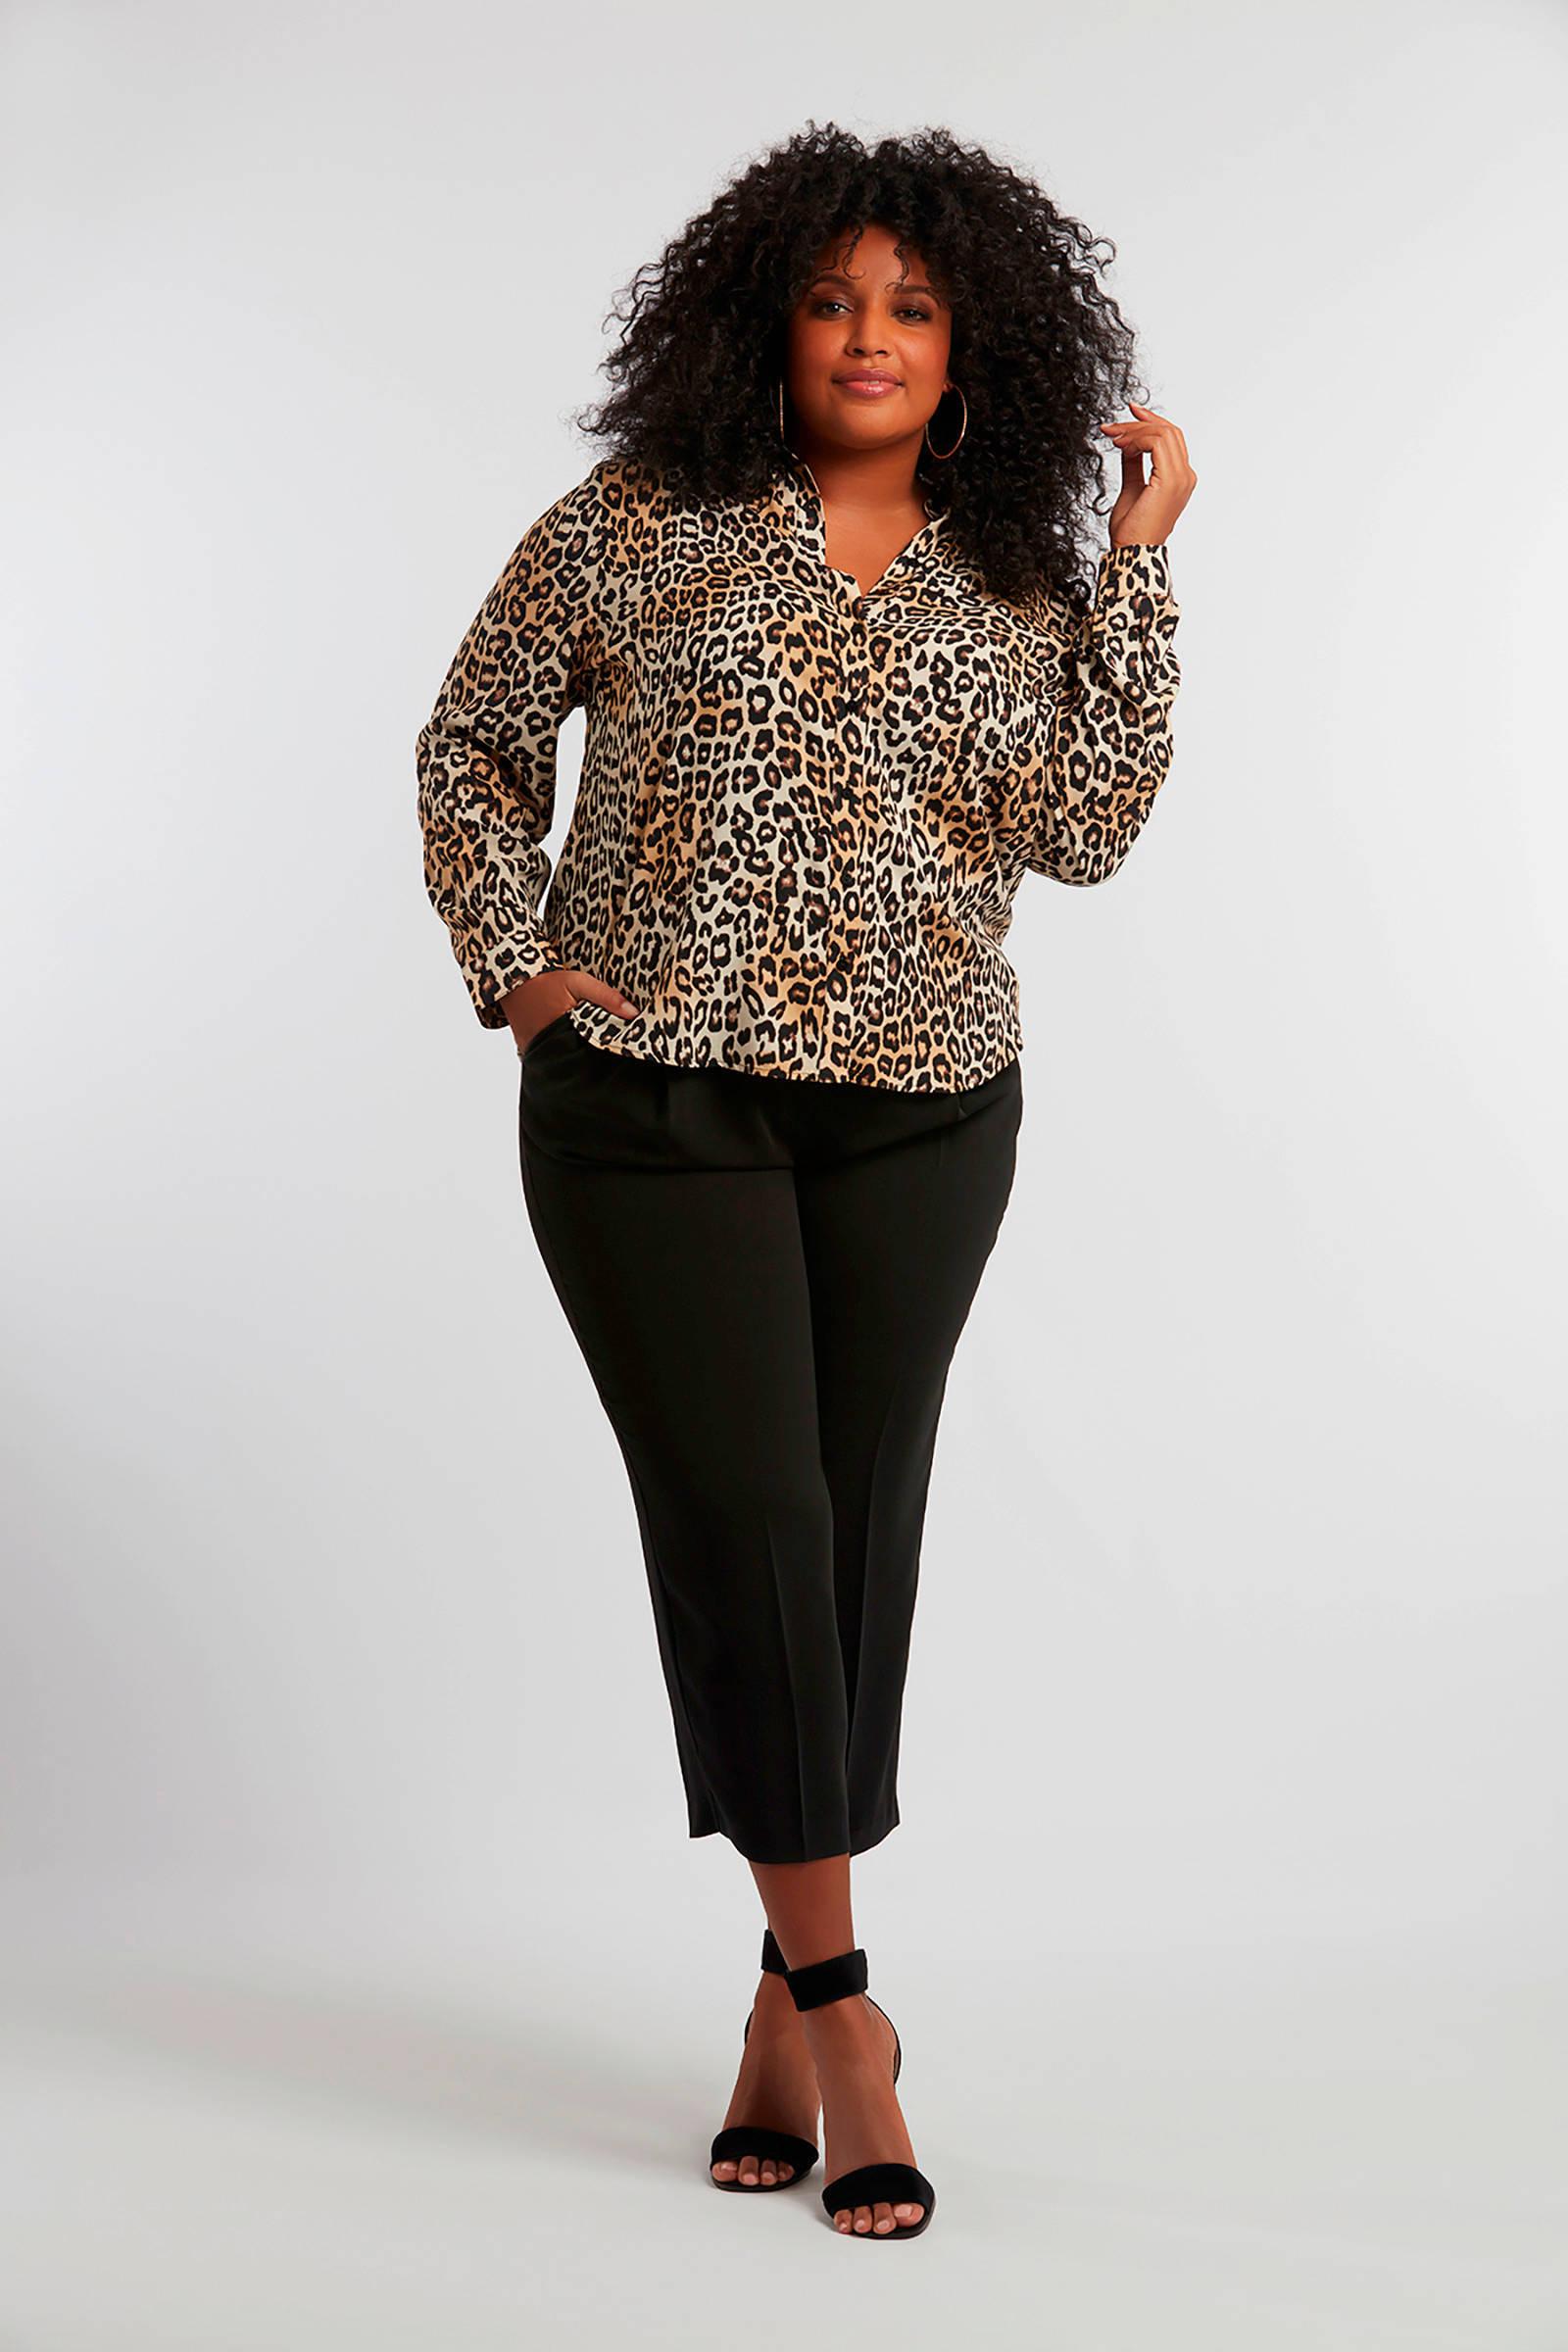 panterprint Mode met blouse MS bruin qUTwggtpx